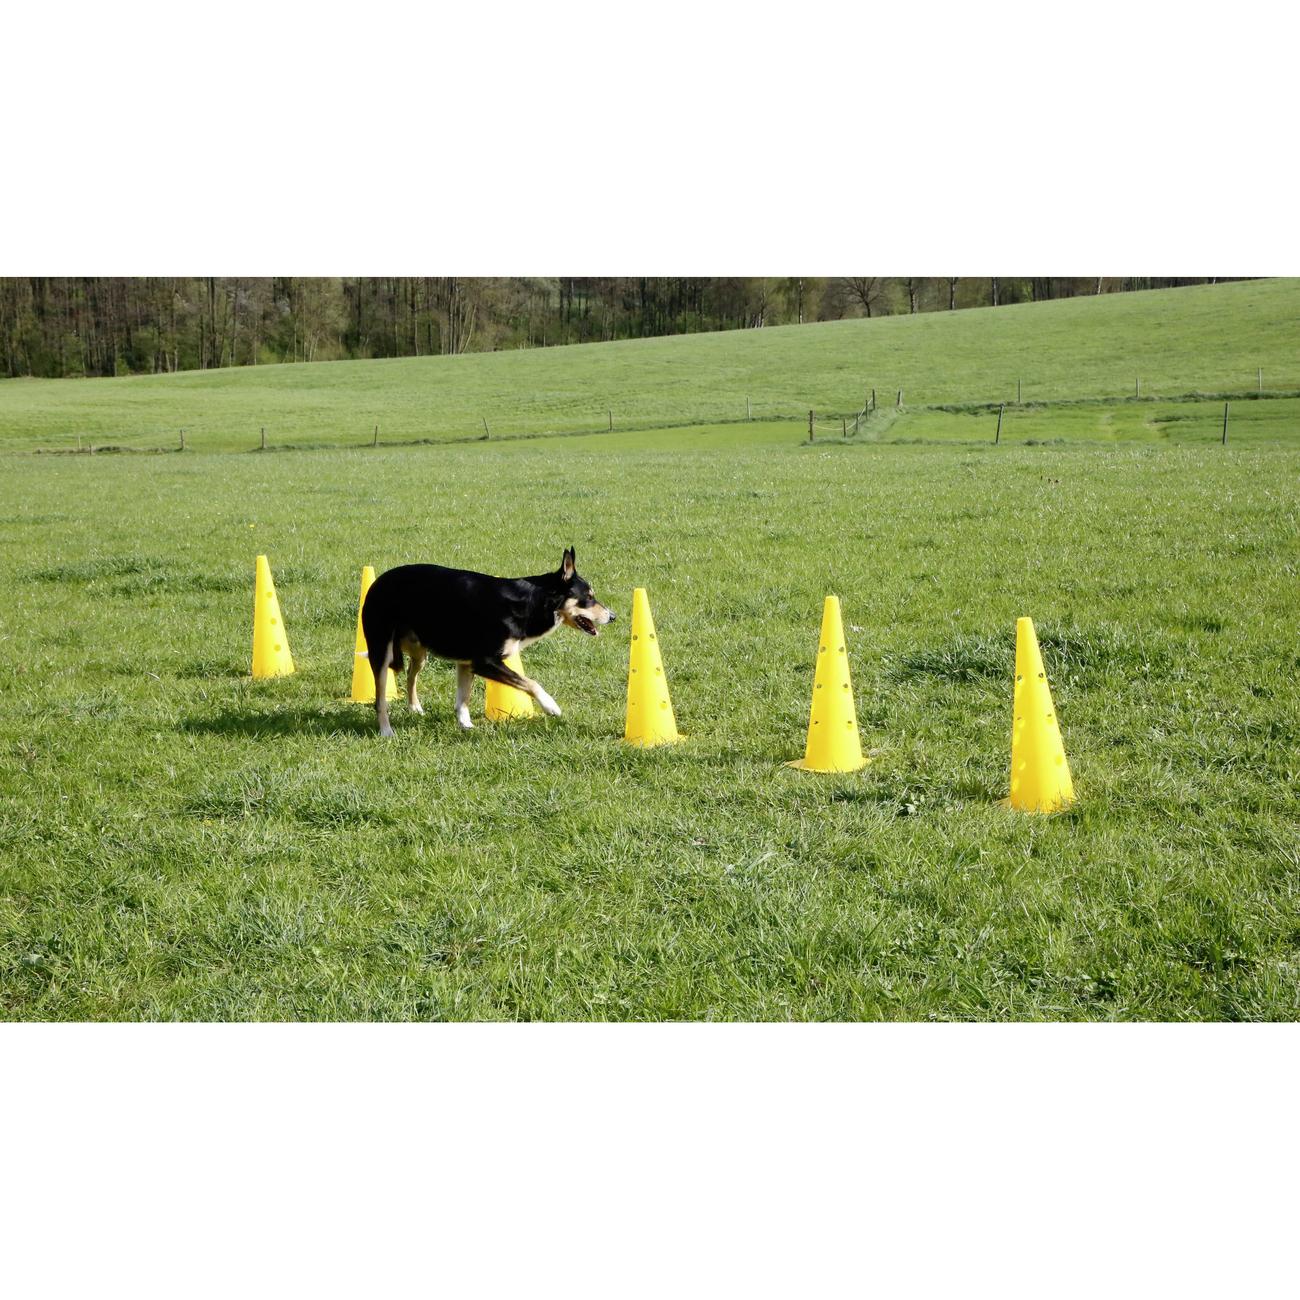 Kerbl Agility Pylonen-Hürden Set für Hunde, Bild 3